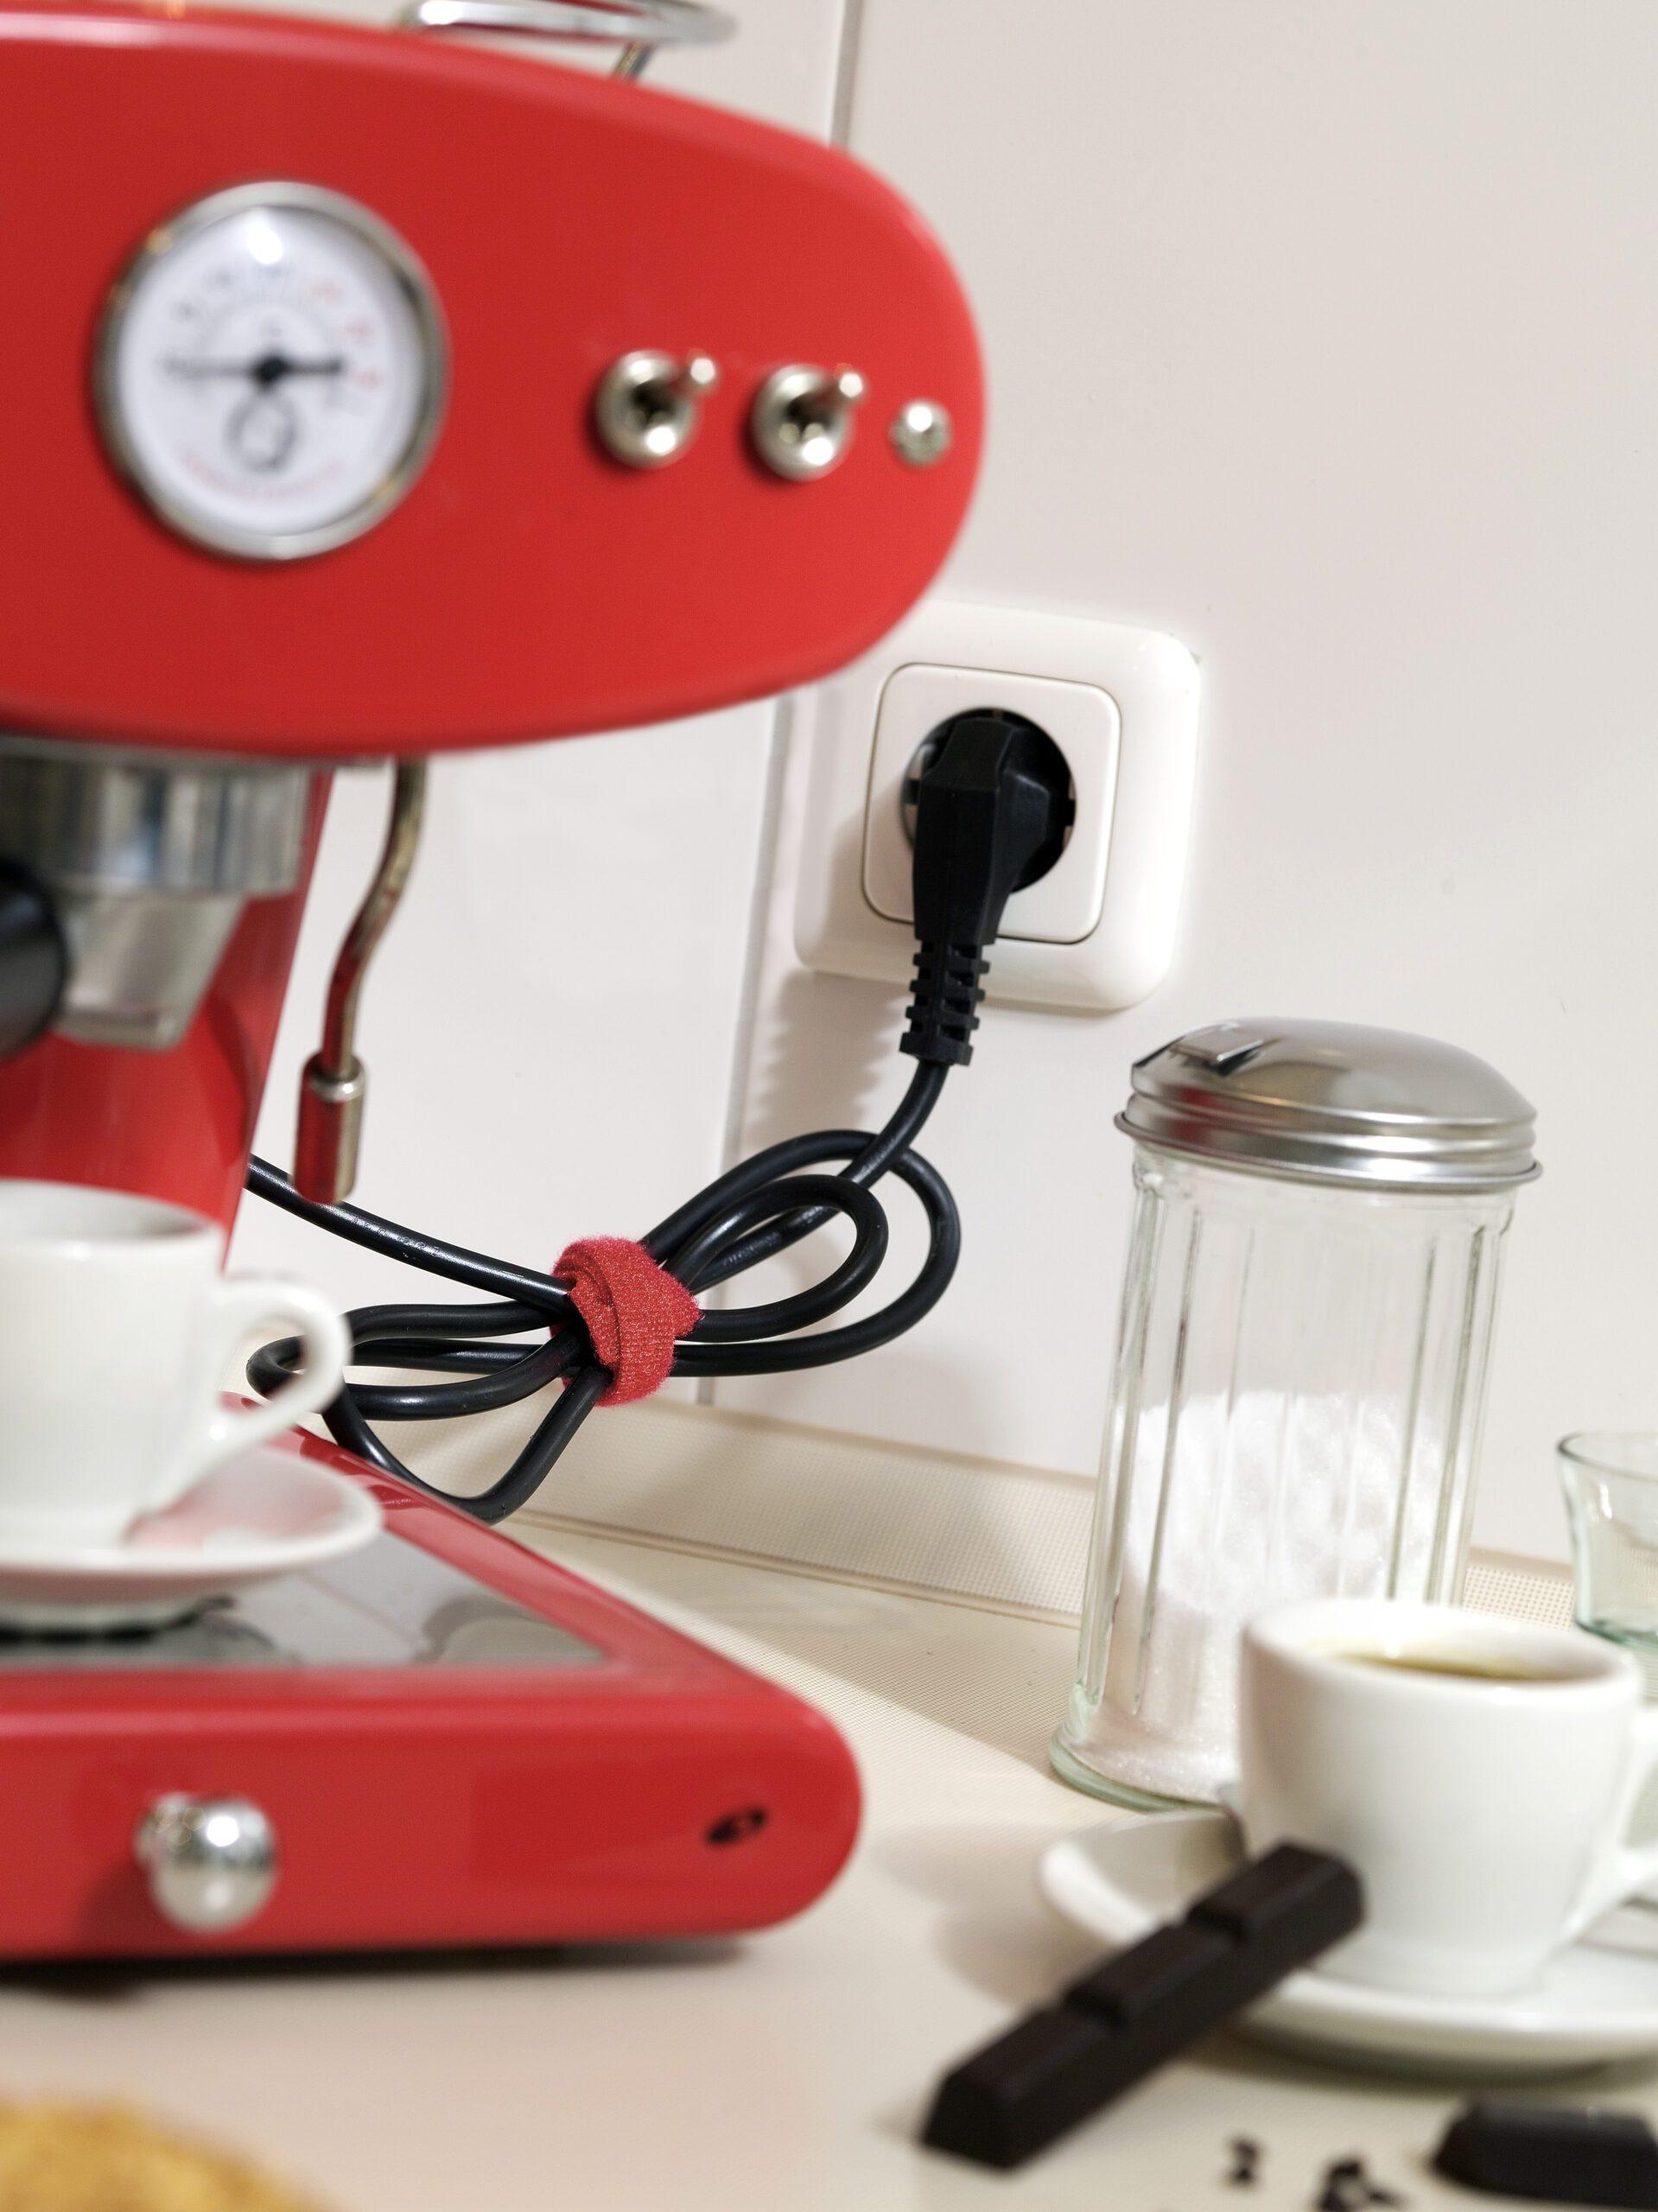 spring cleaning checklist - organize appliances